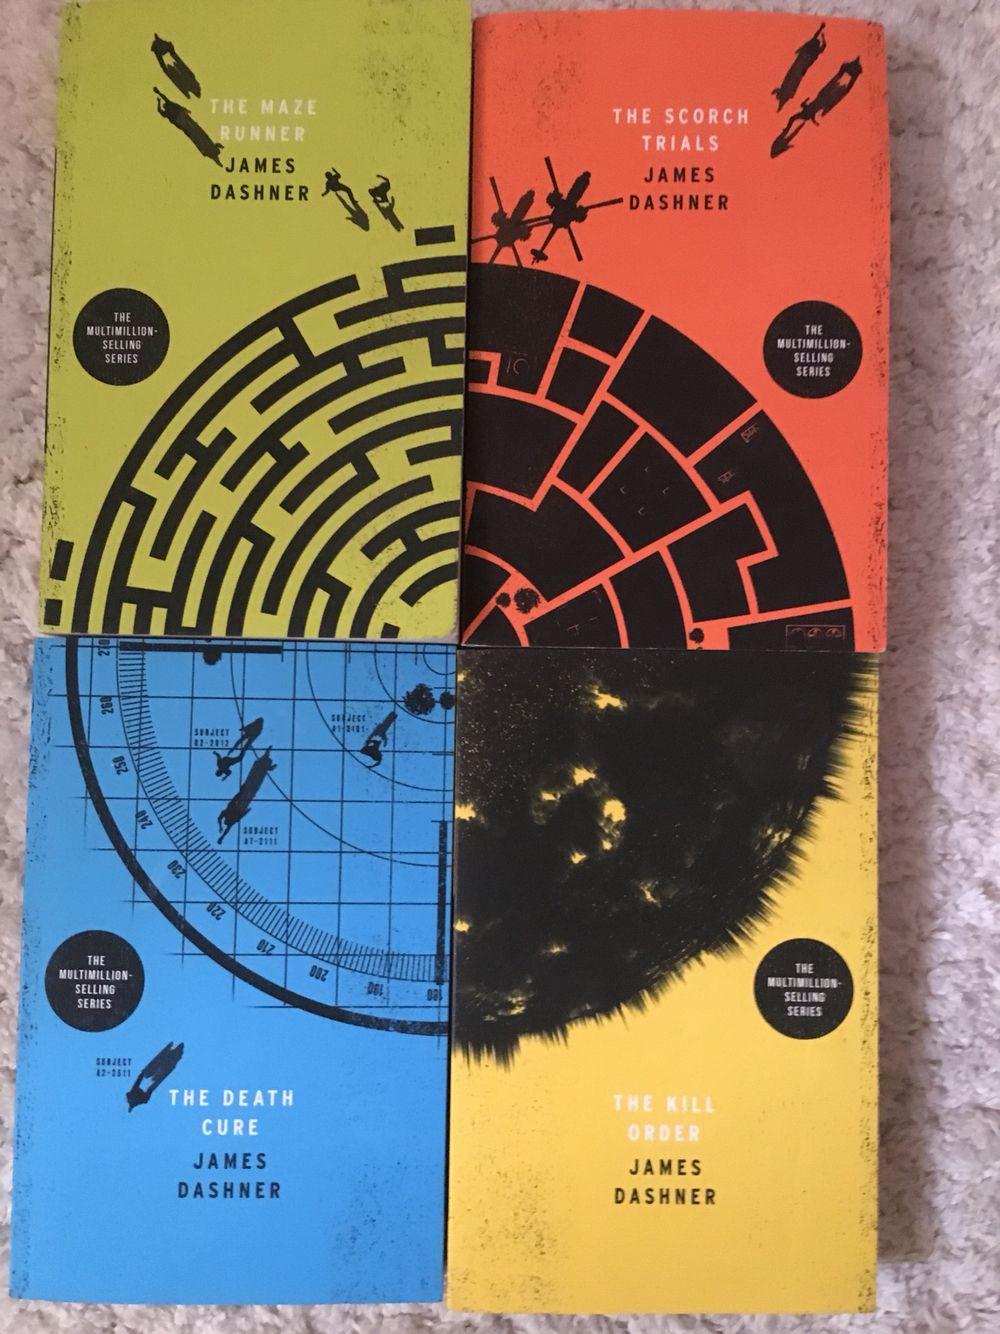 Finally got all four corners of the maze runner books